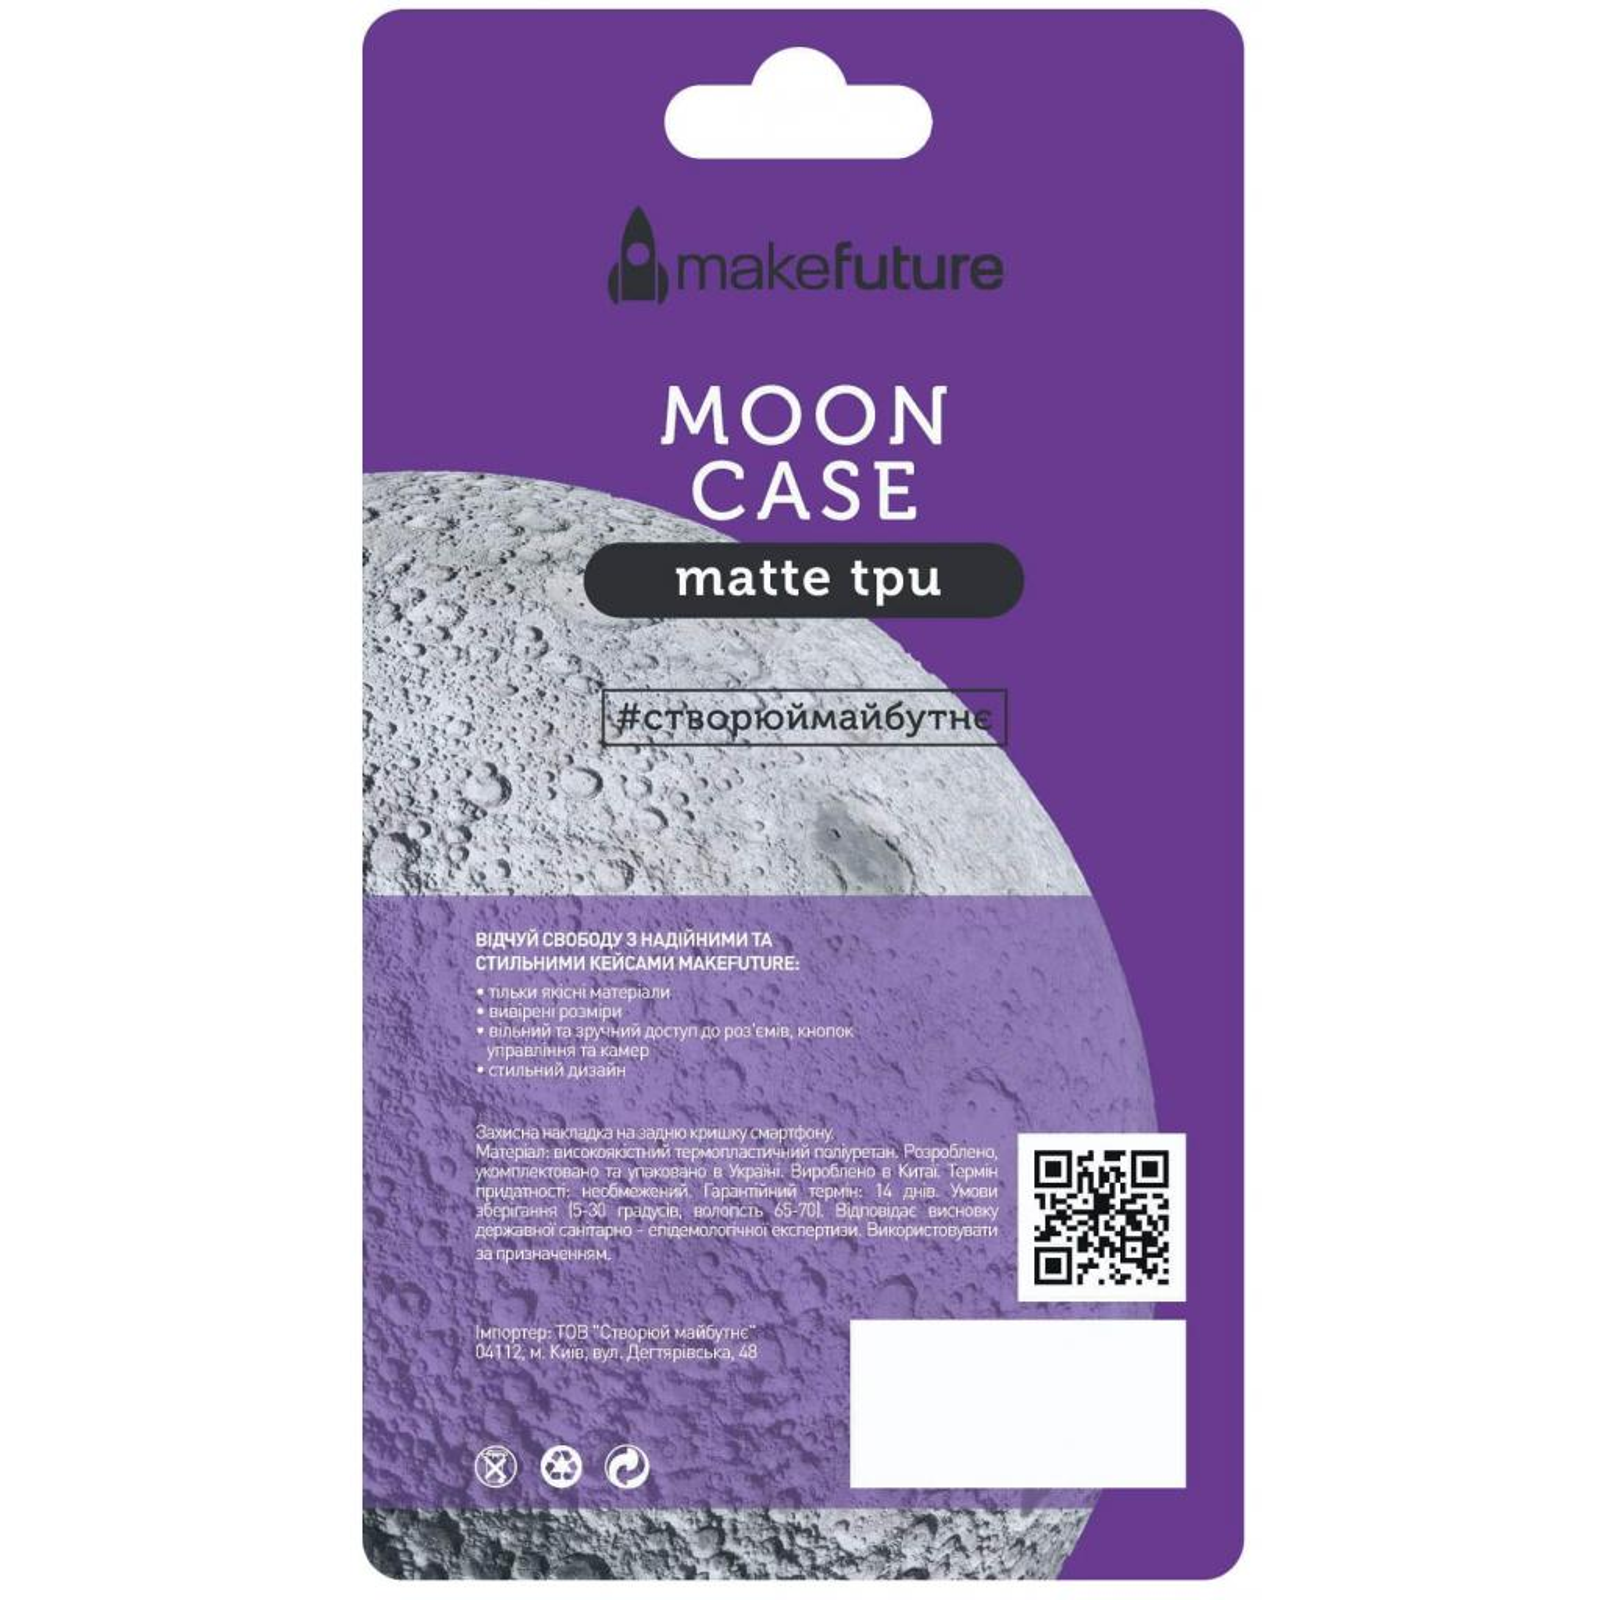 Чехол для моб. телефона MakeFuture Moon Case (TPU) Huawei P Smart Plus Black (MCM-HUPSPBK) изображение 2